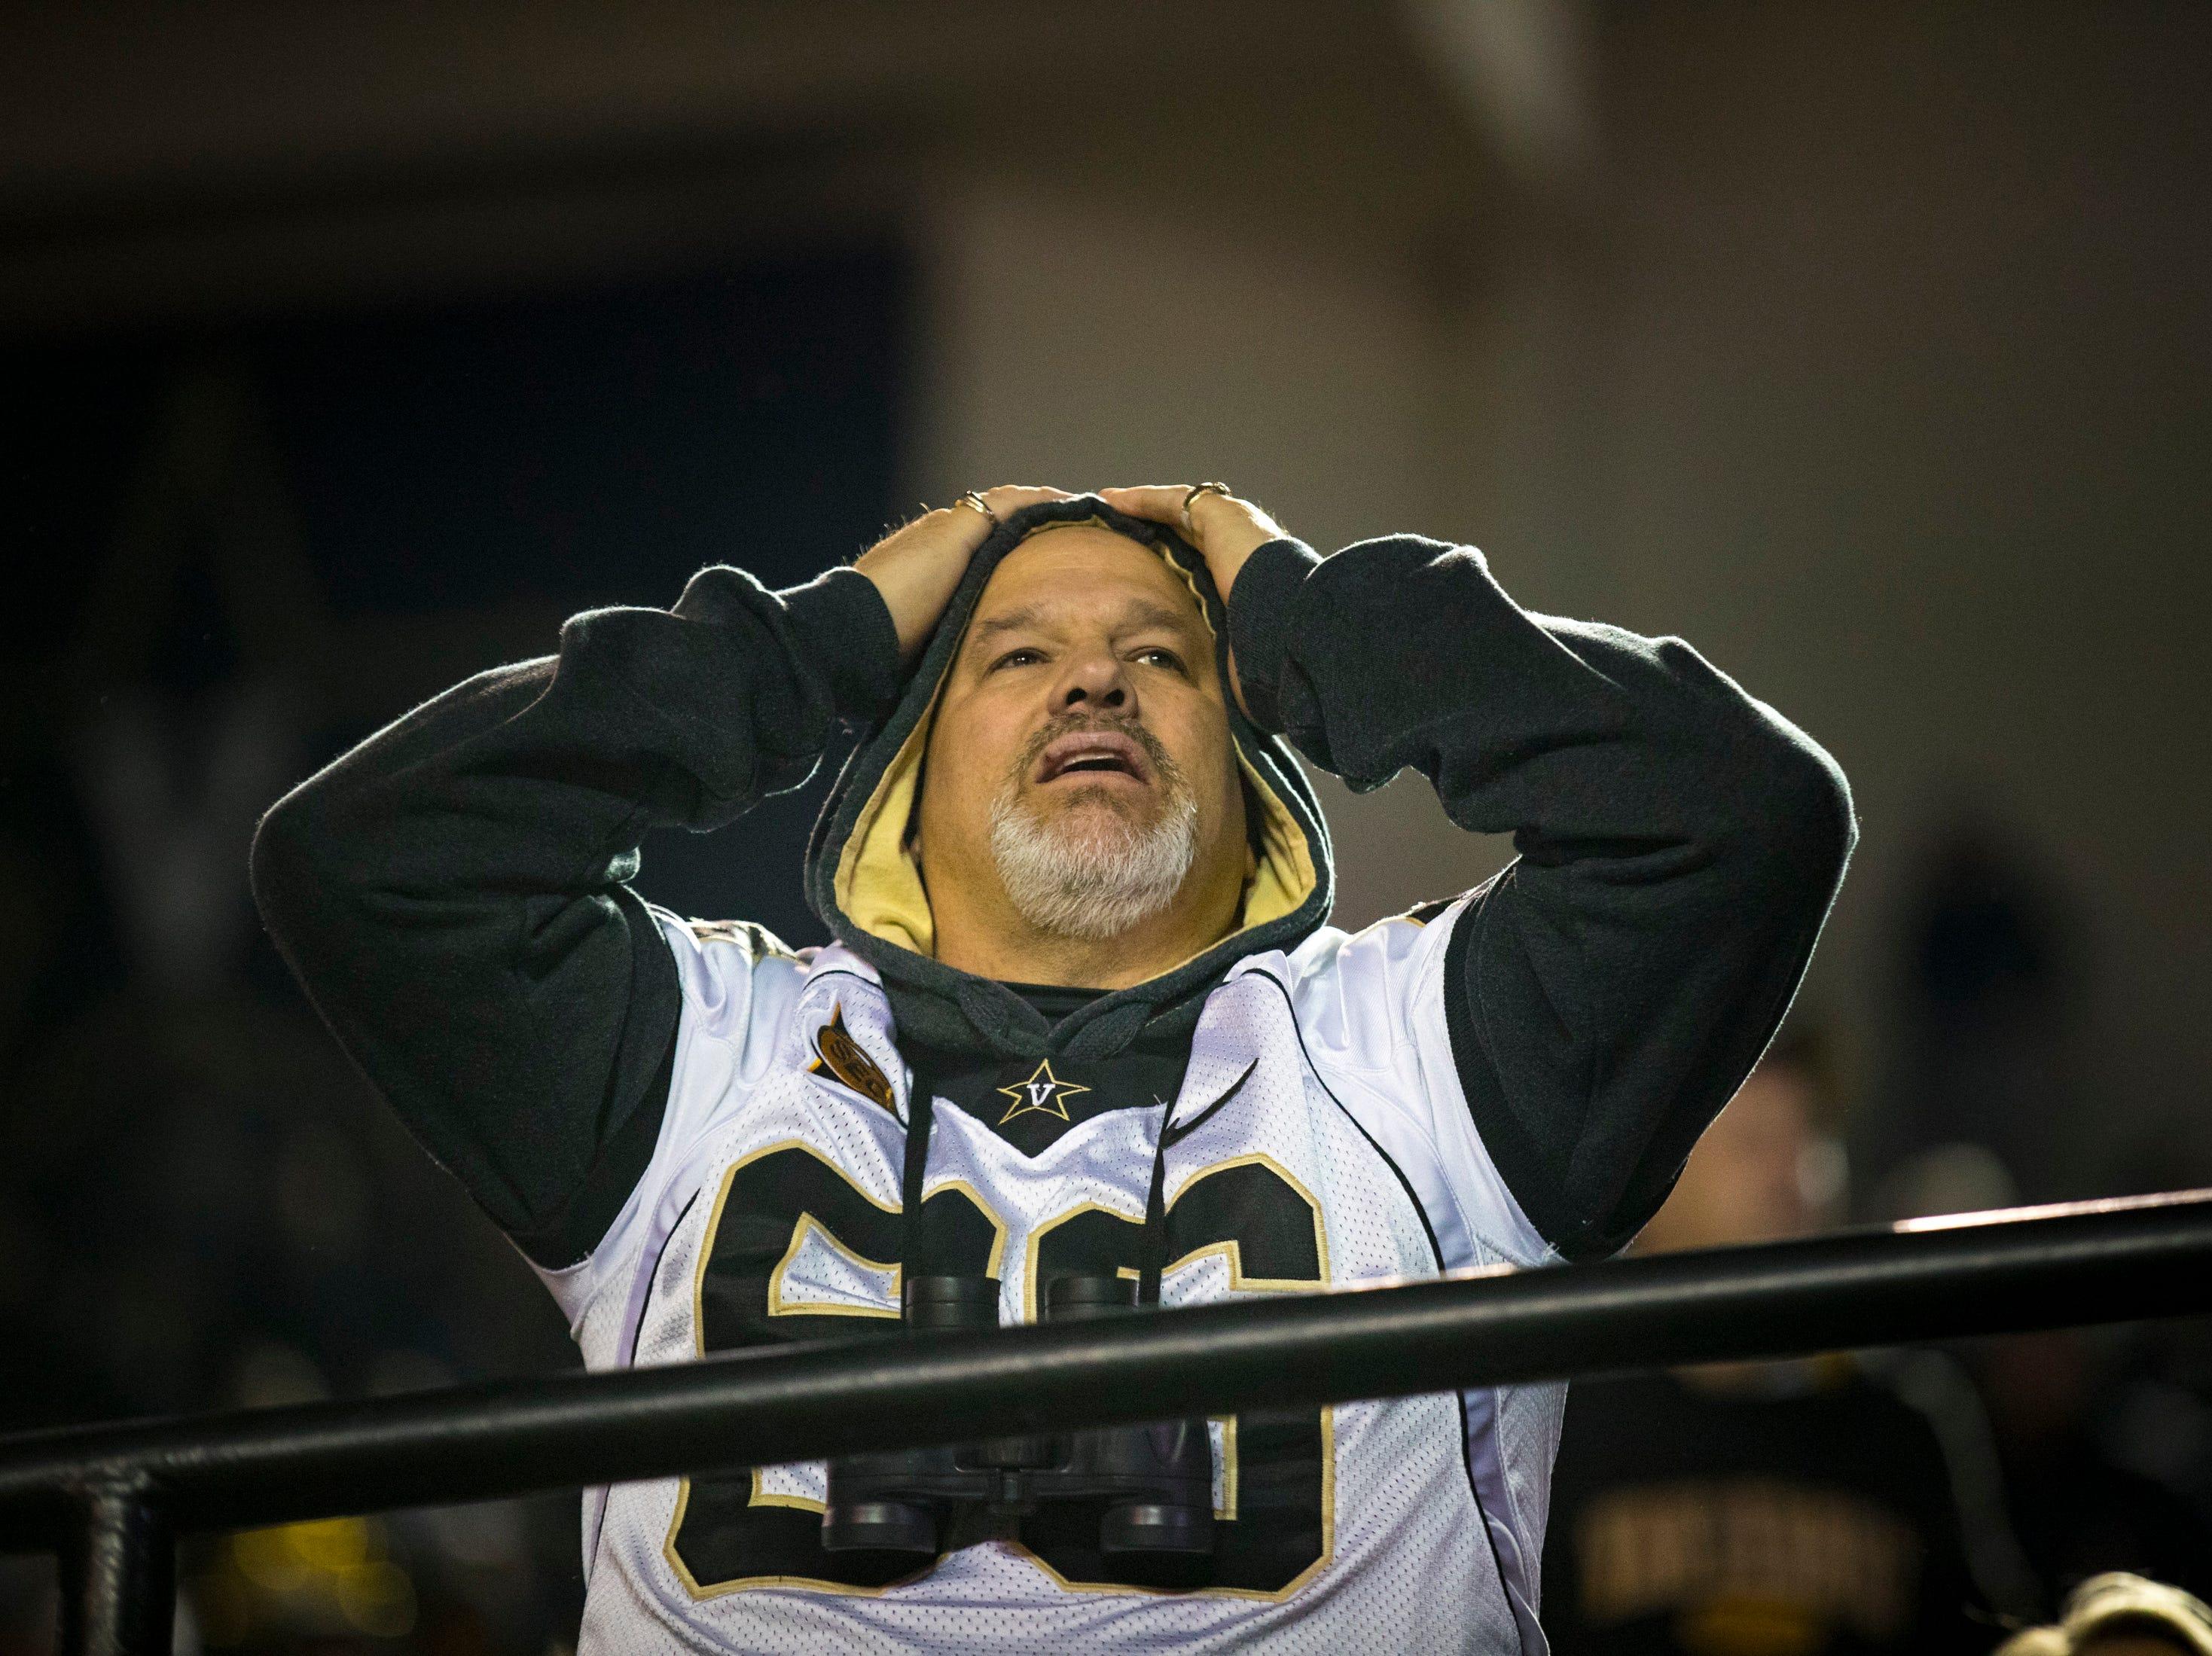 A Vanderbilt fan reacts to a call on the field during Vanderbilt's game against Ole Miss at Vanderbilt Stadium in Nashville on Saturday, Nov. 17, 2018.